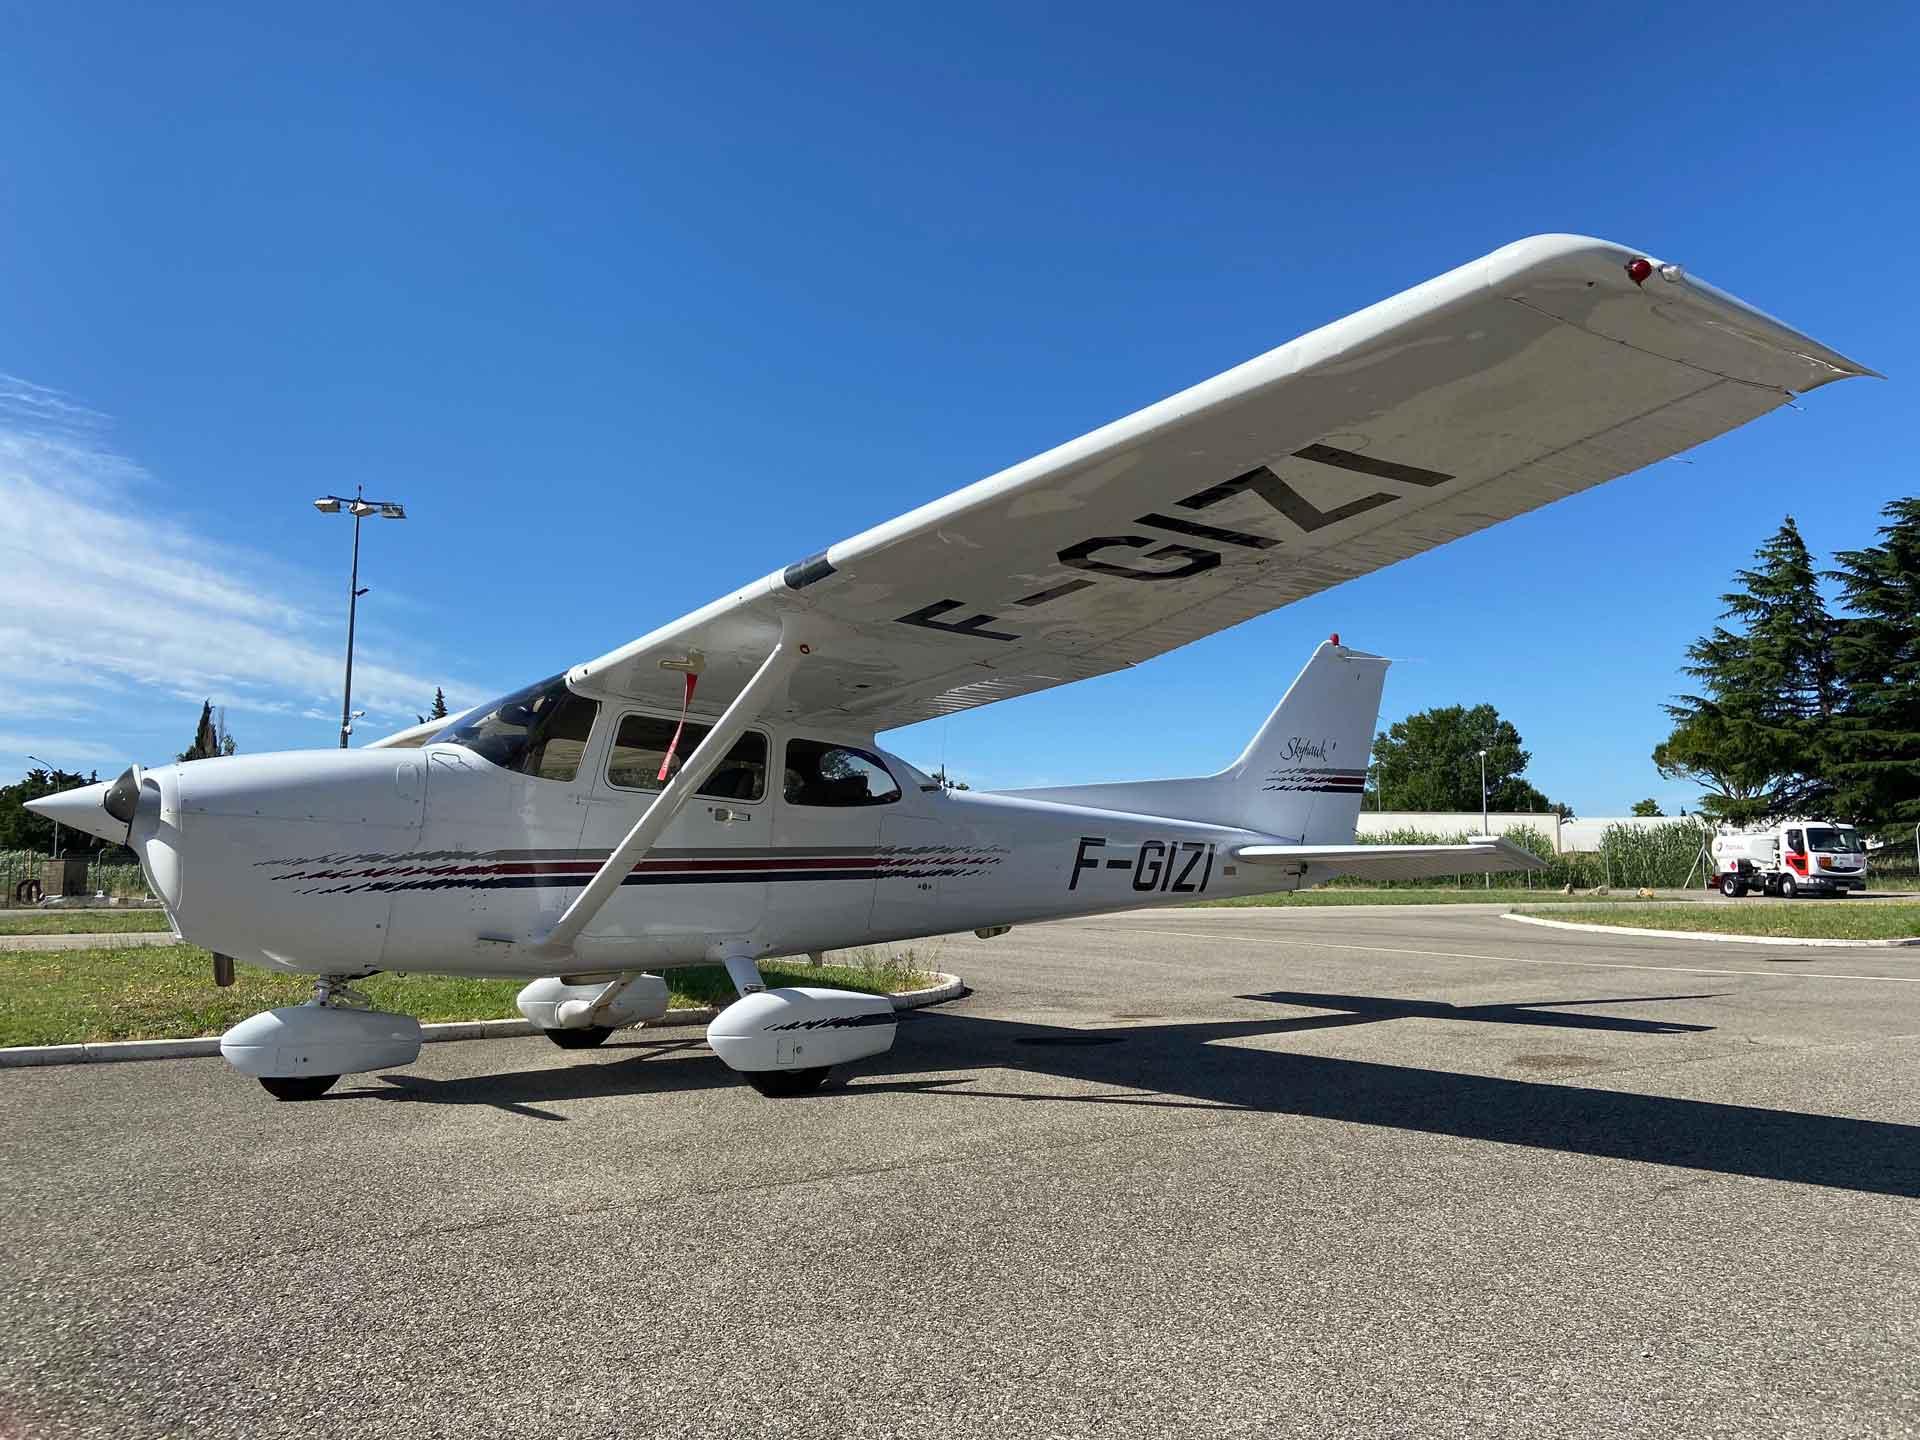 1998 CESSNA 172R «Skyhawk» 180HP ATA by Pelletier occasion